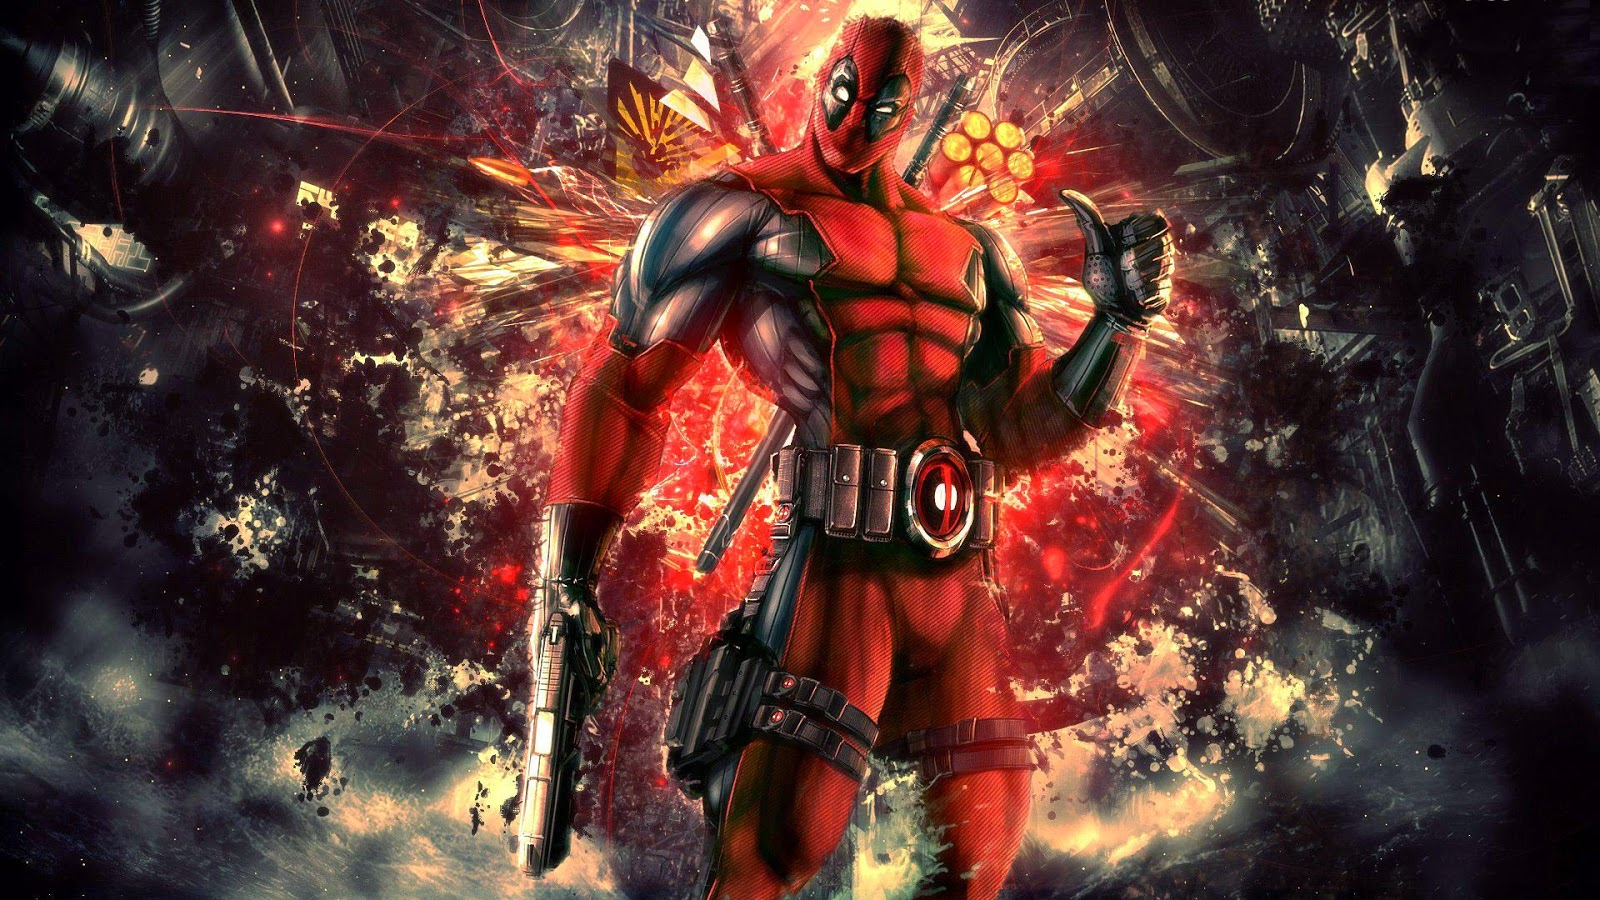 Papel de Parede Fantasia Deadpool Fantasy Deadpool wallpaper hd image free